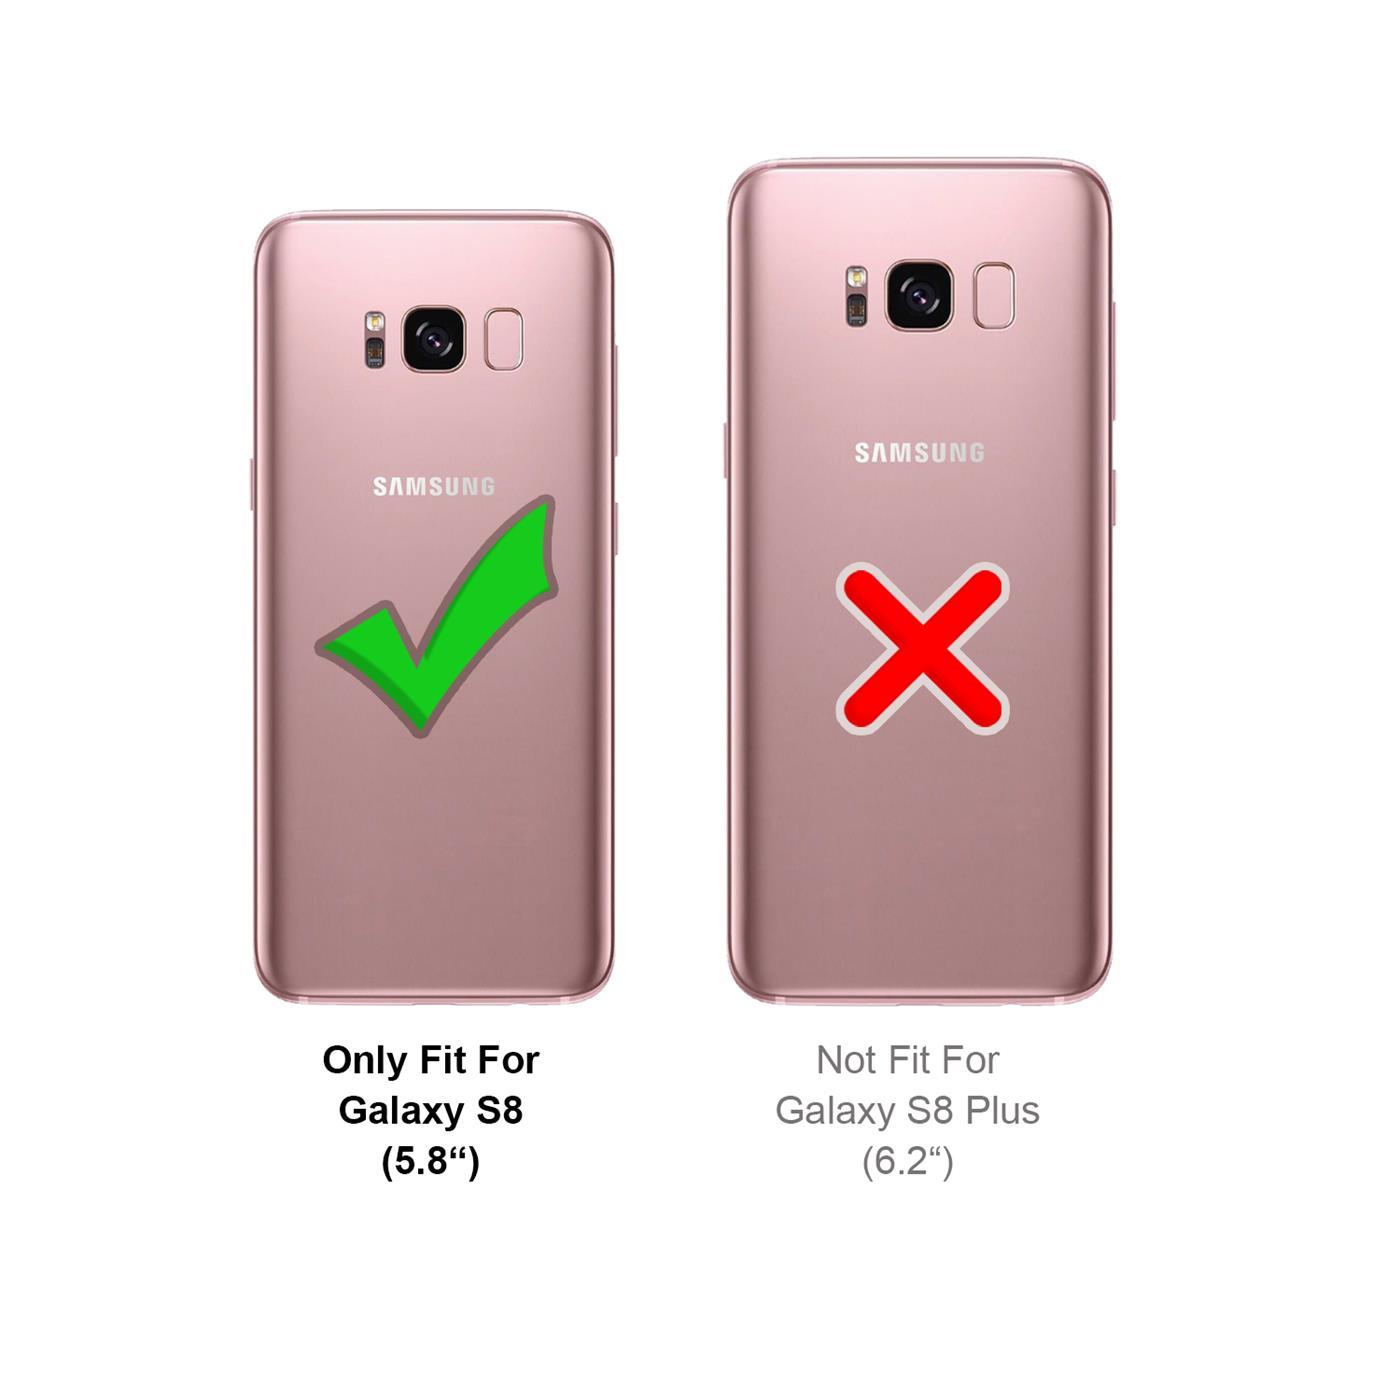 Hard-Back-Case-Cover-Samsung-Galaxy-j3-2016-duenn-Cover-Slim-Shockproof-Rugged Indexbild 15